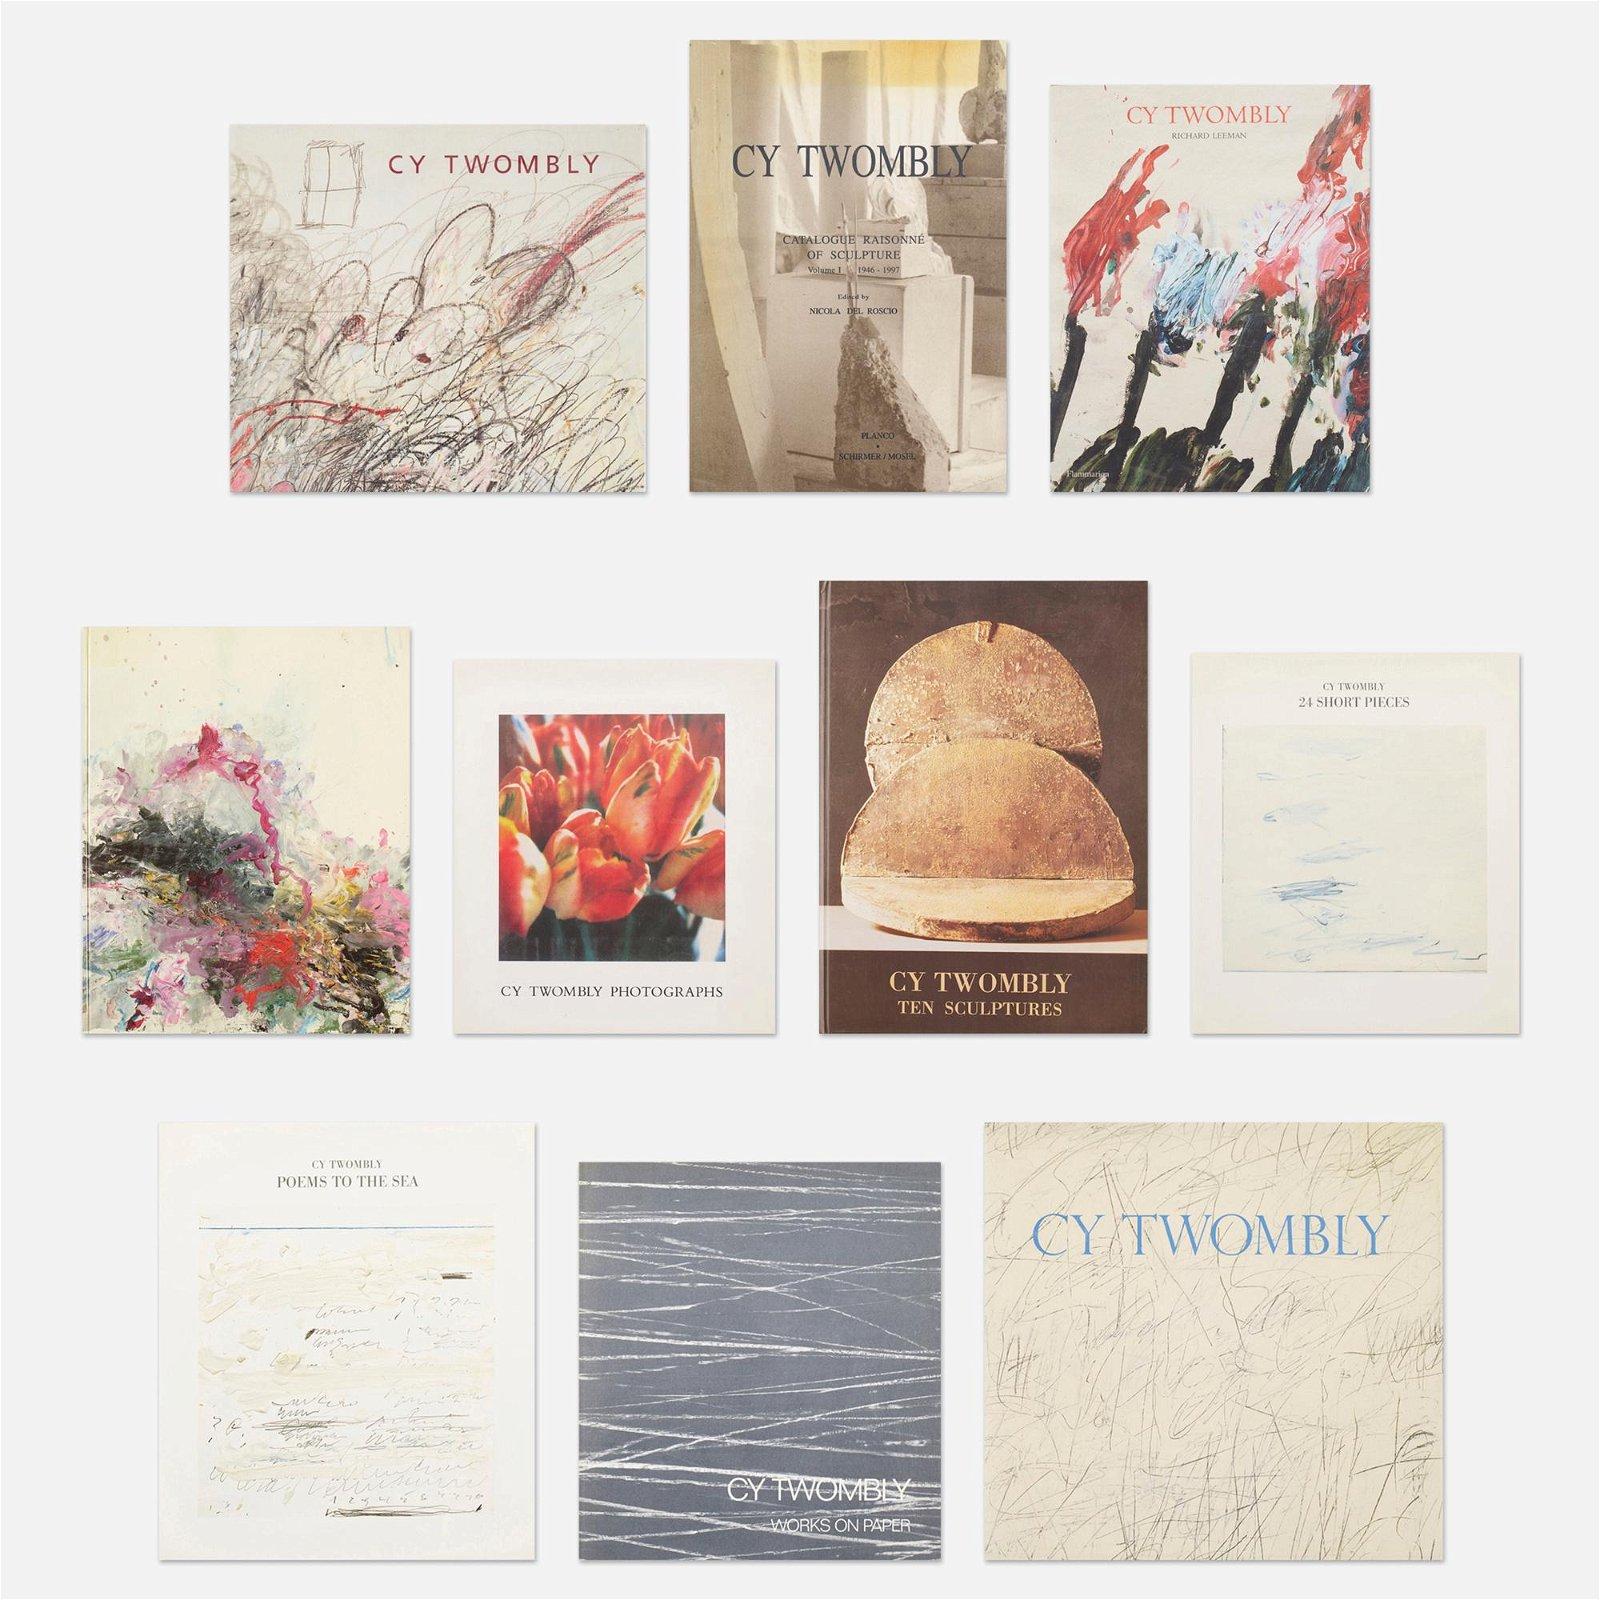 Cy Twombly monographs, twenty-eight